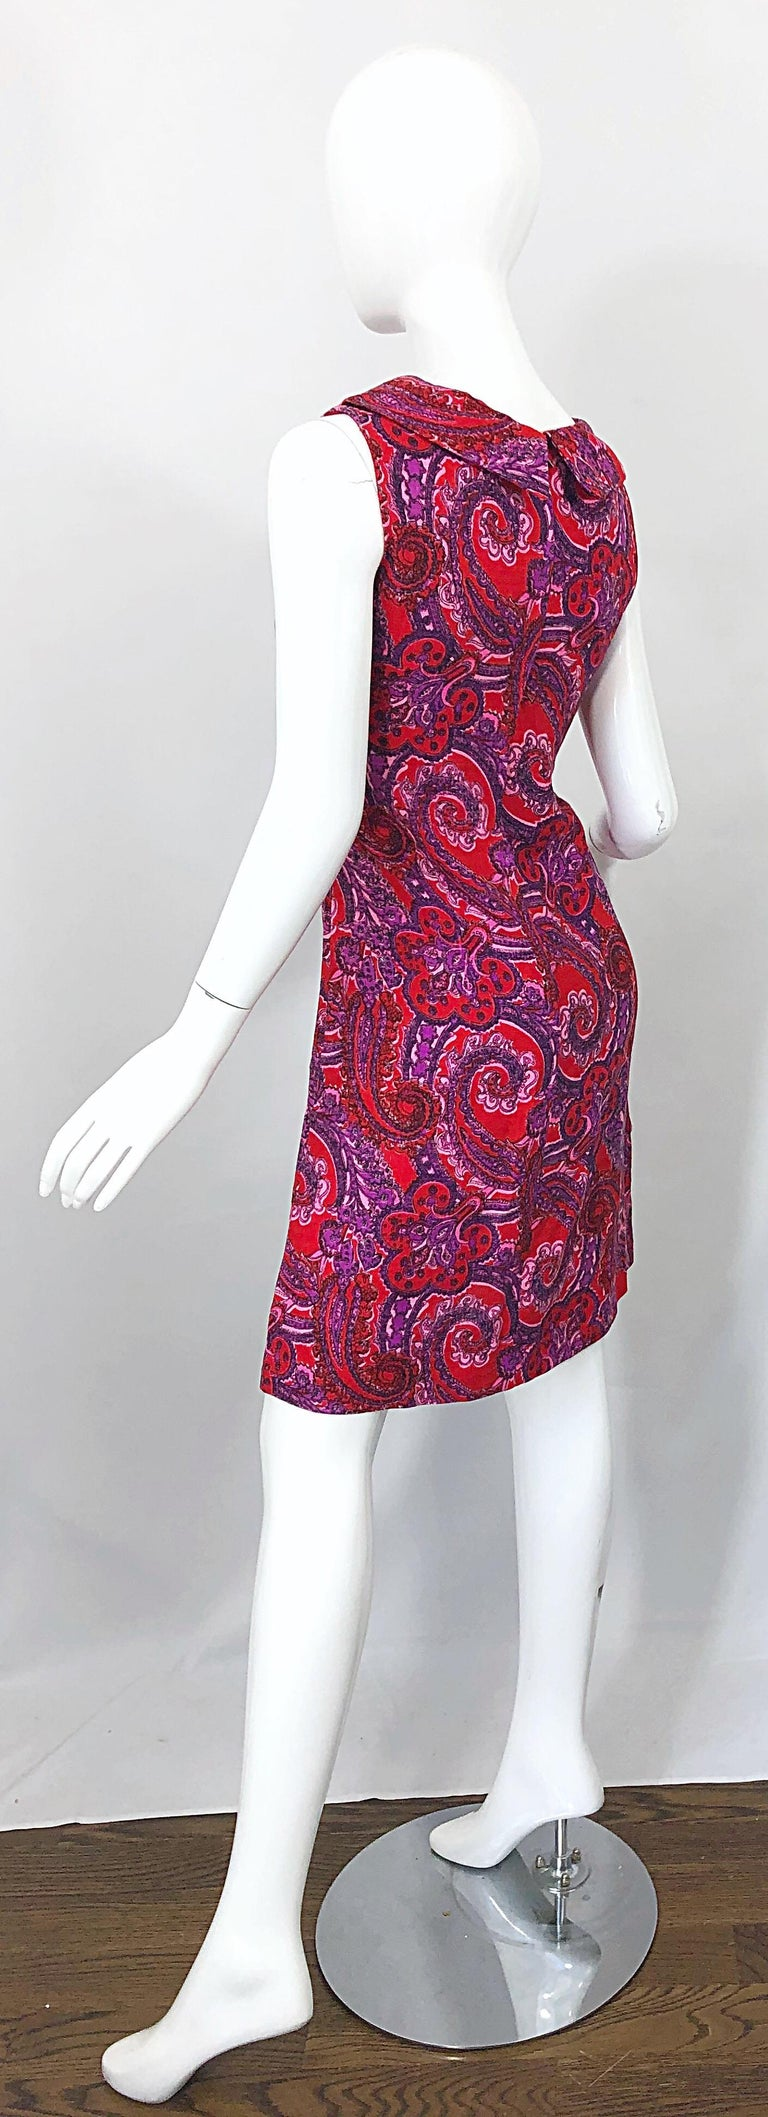 Chic 1960s Irish Linen Pink + Red + Purple Paisley Vintage 60s Mod Shift Dress For Sale 5